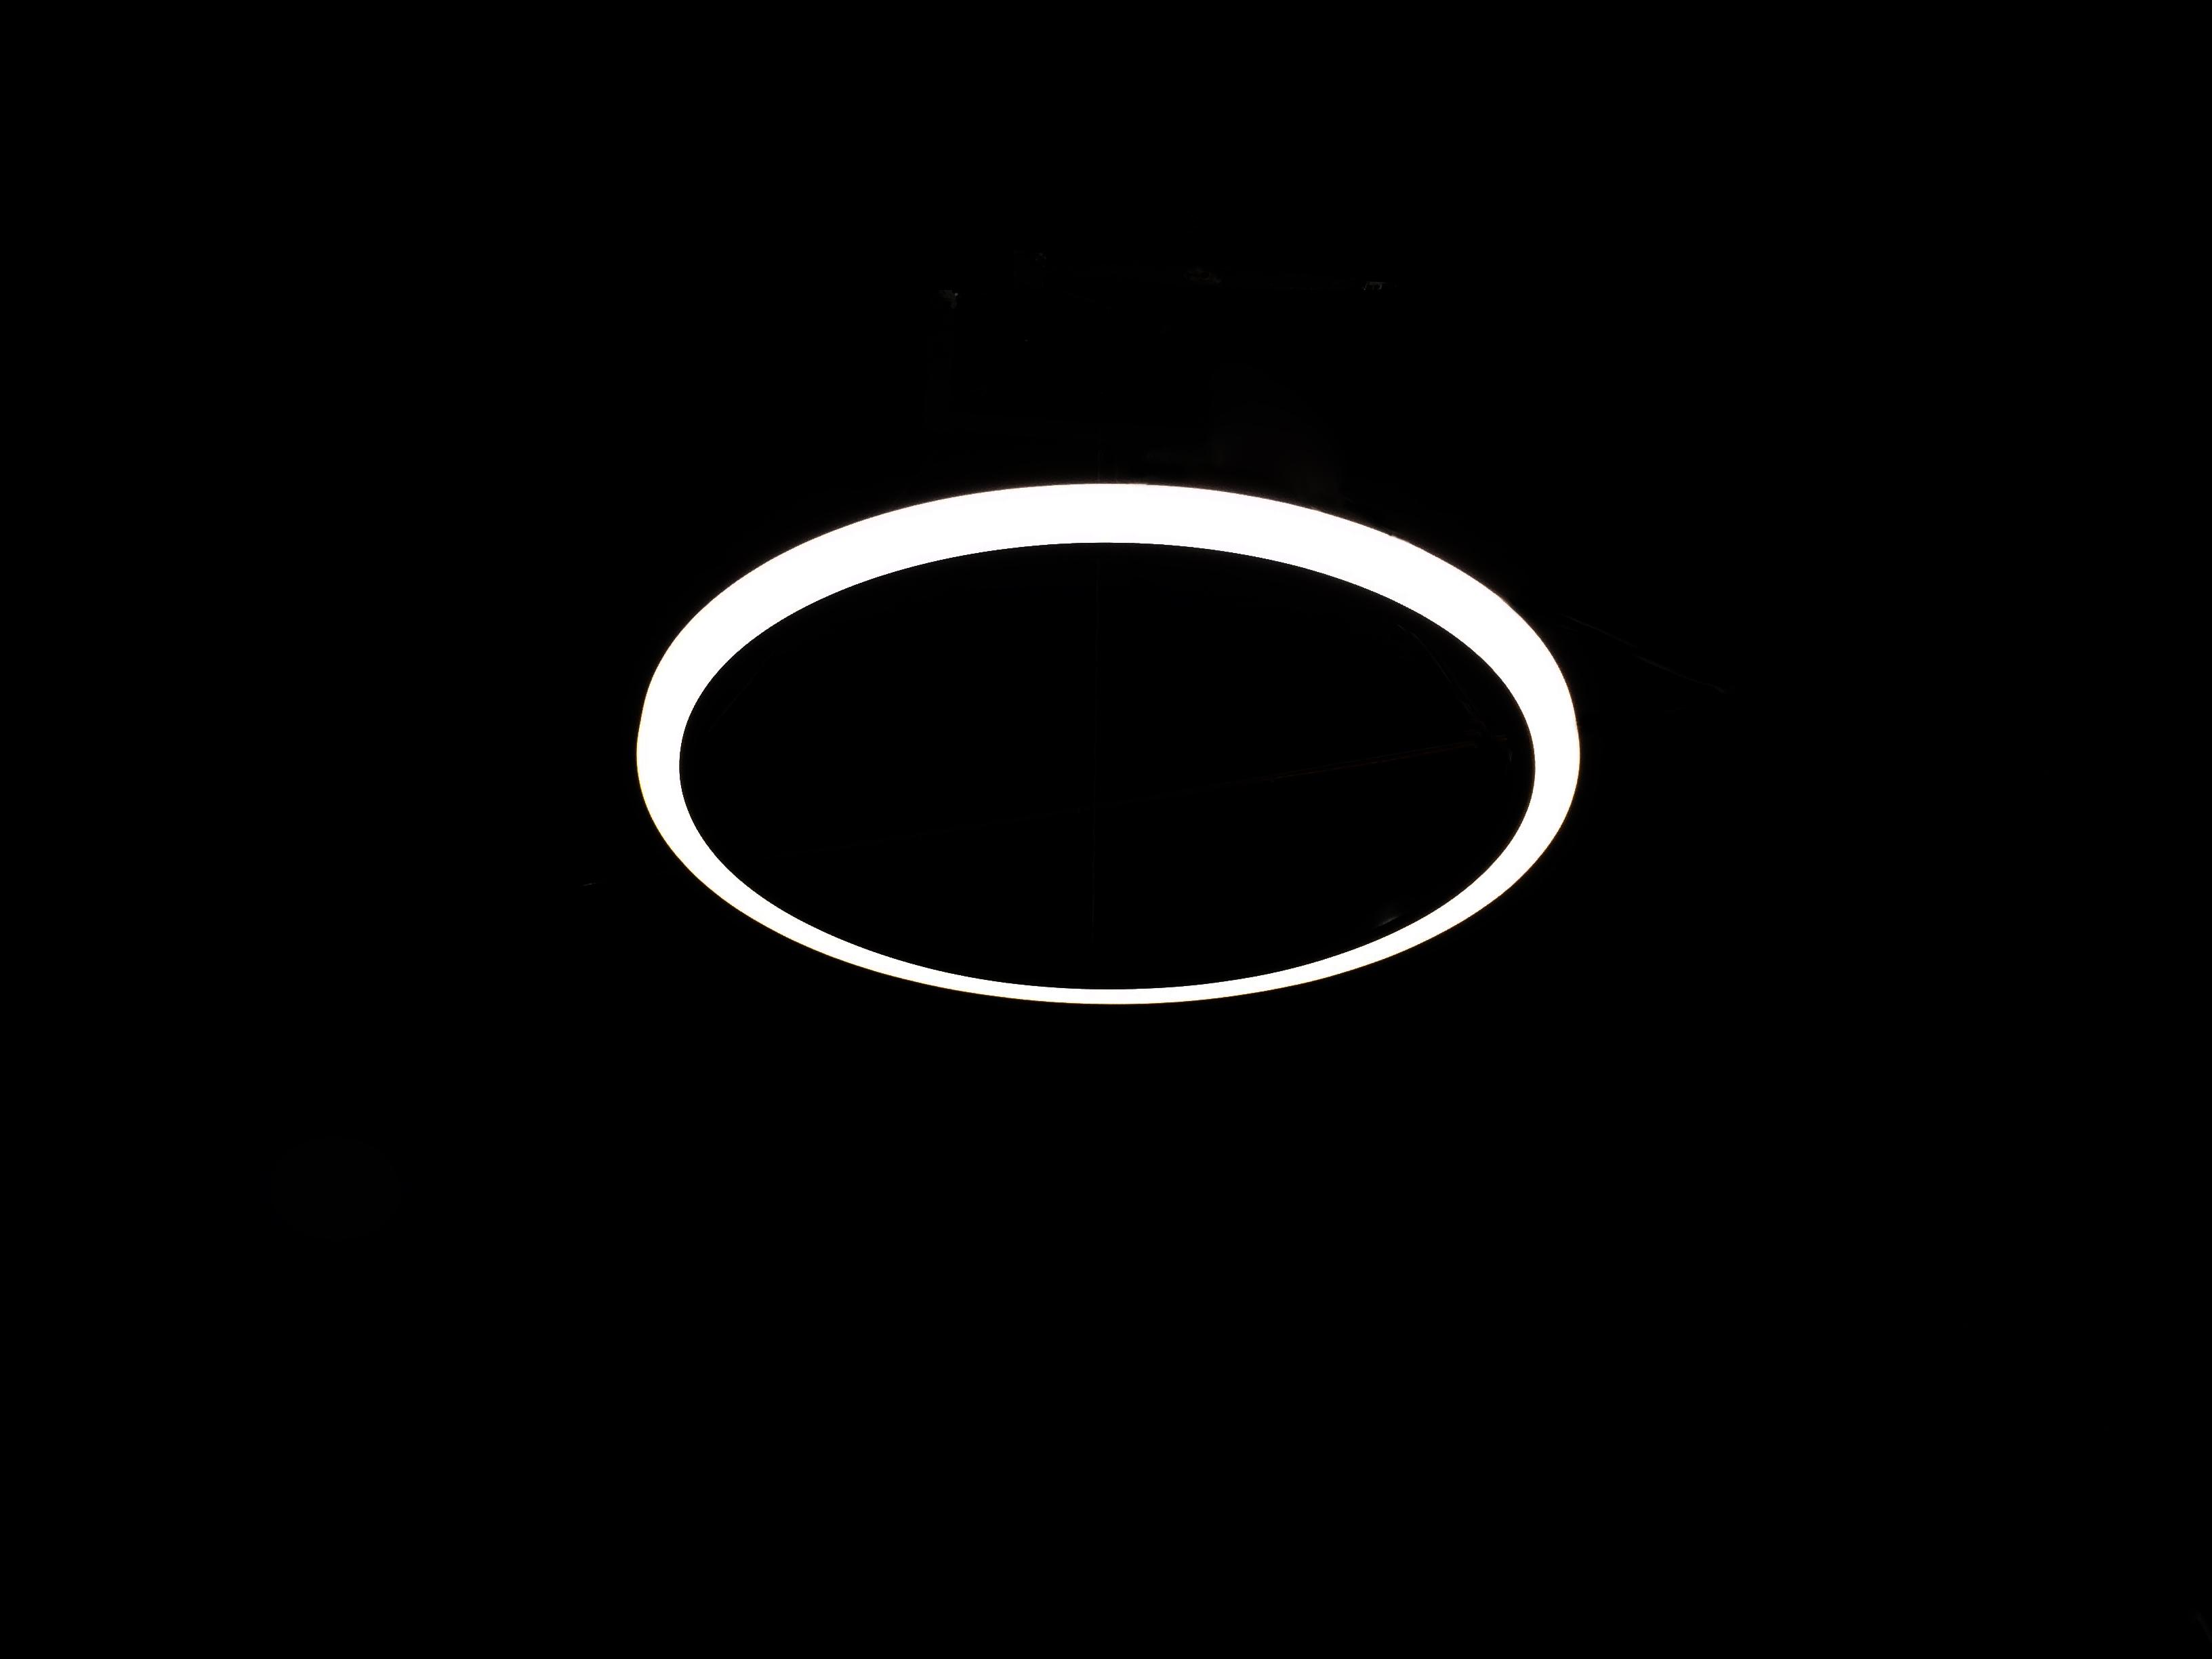 Acrylic Ring LED Light 1000_NEONNY